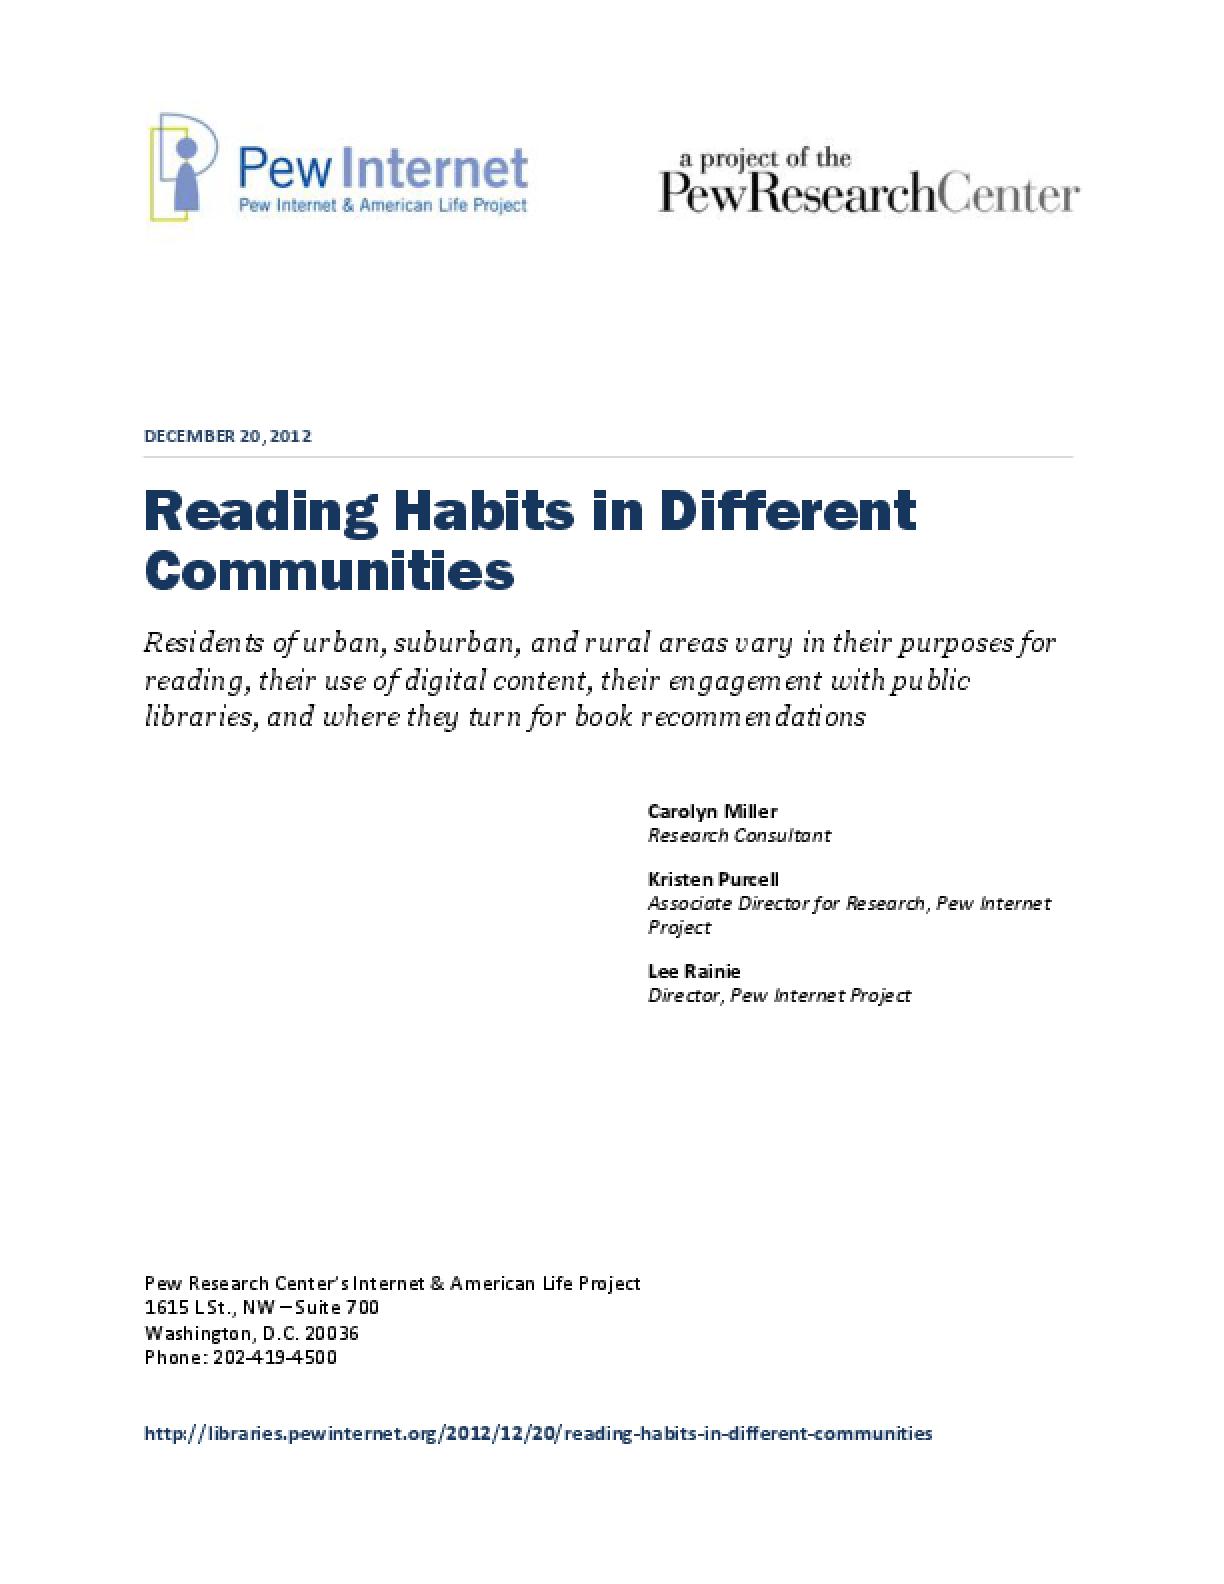 Reading Habits in Different Communities